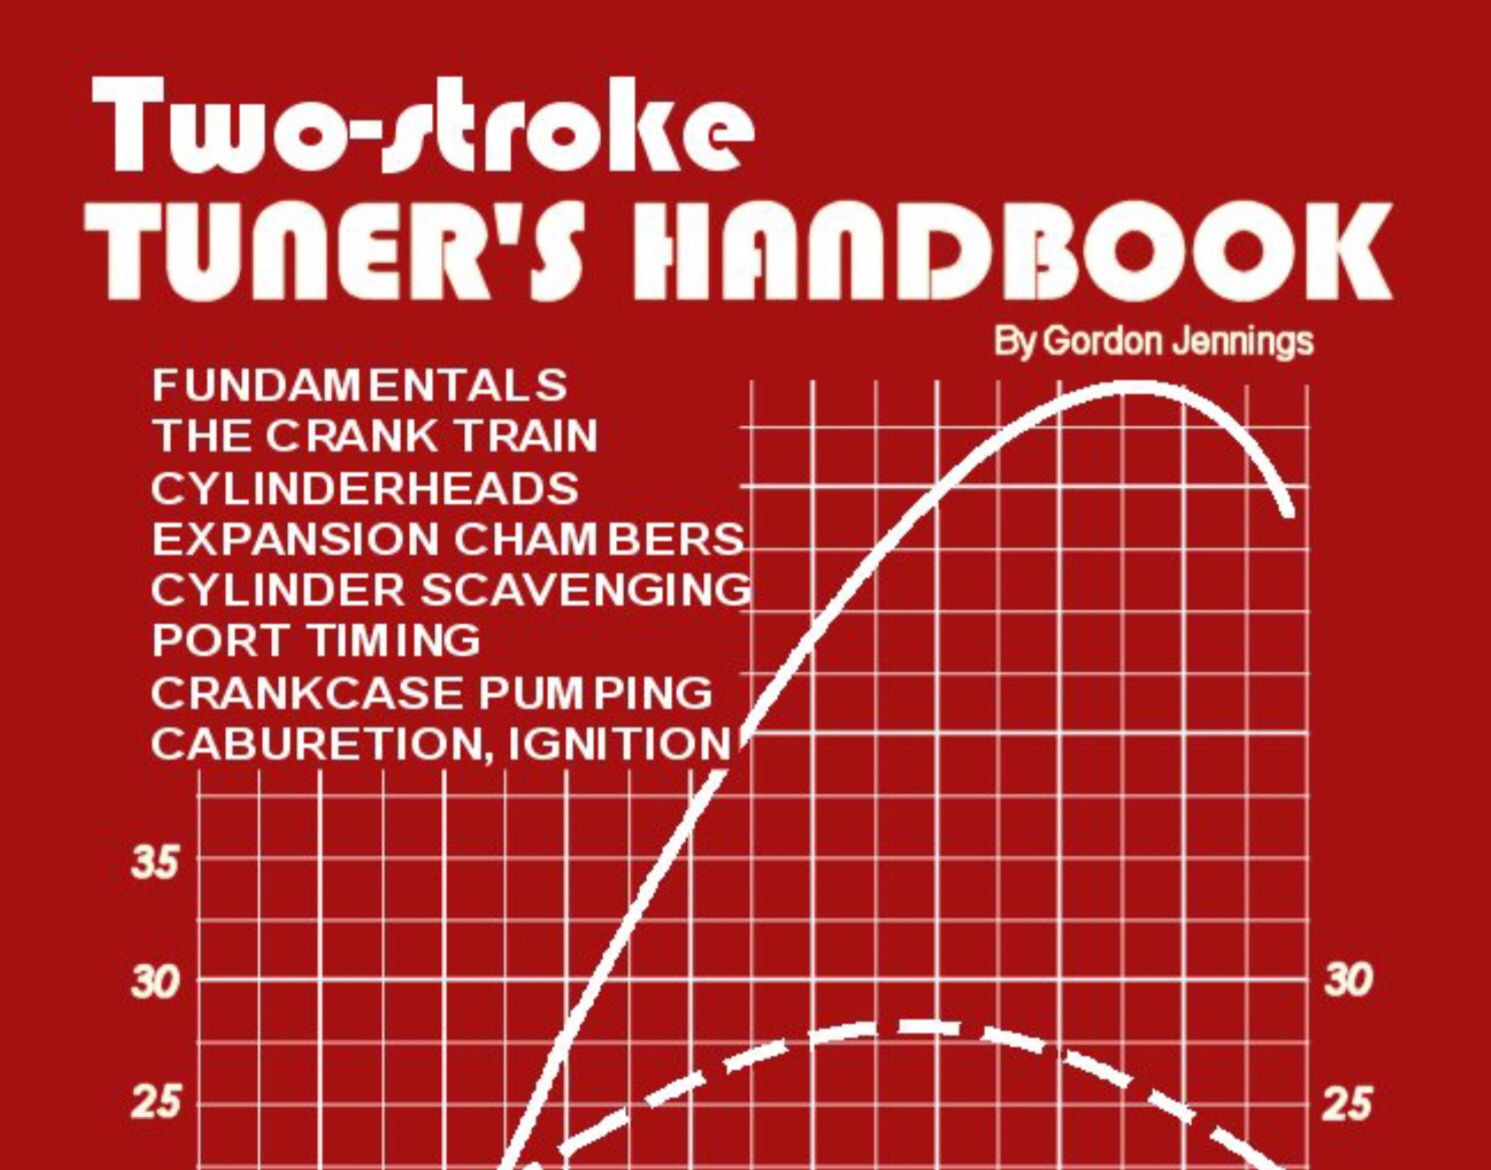 Gordon Jenning's Two Stroke Tuners Handbook